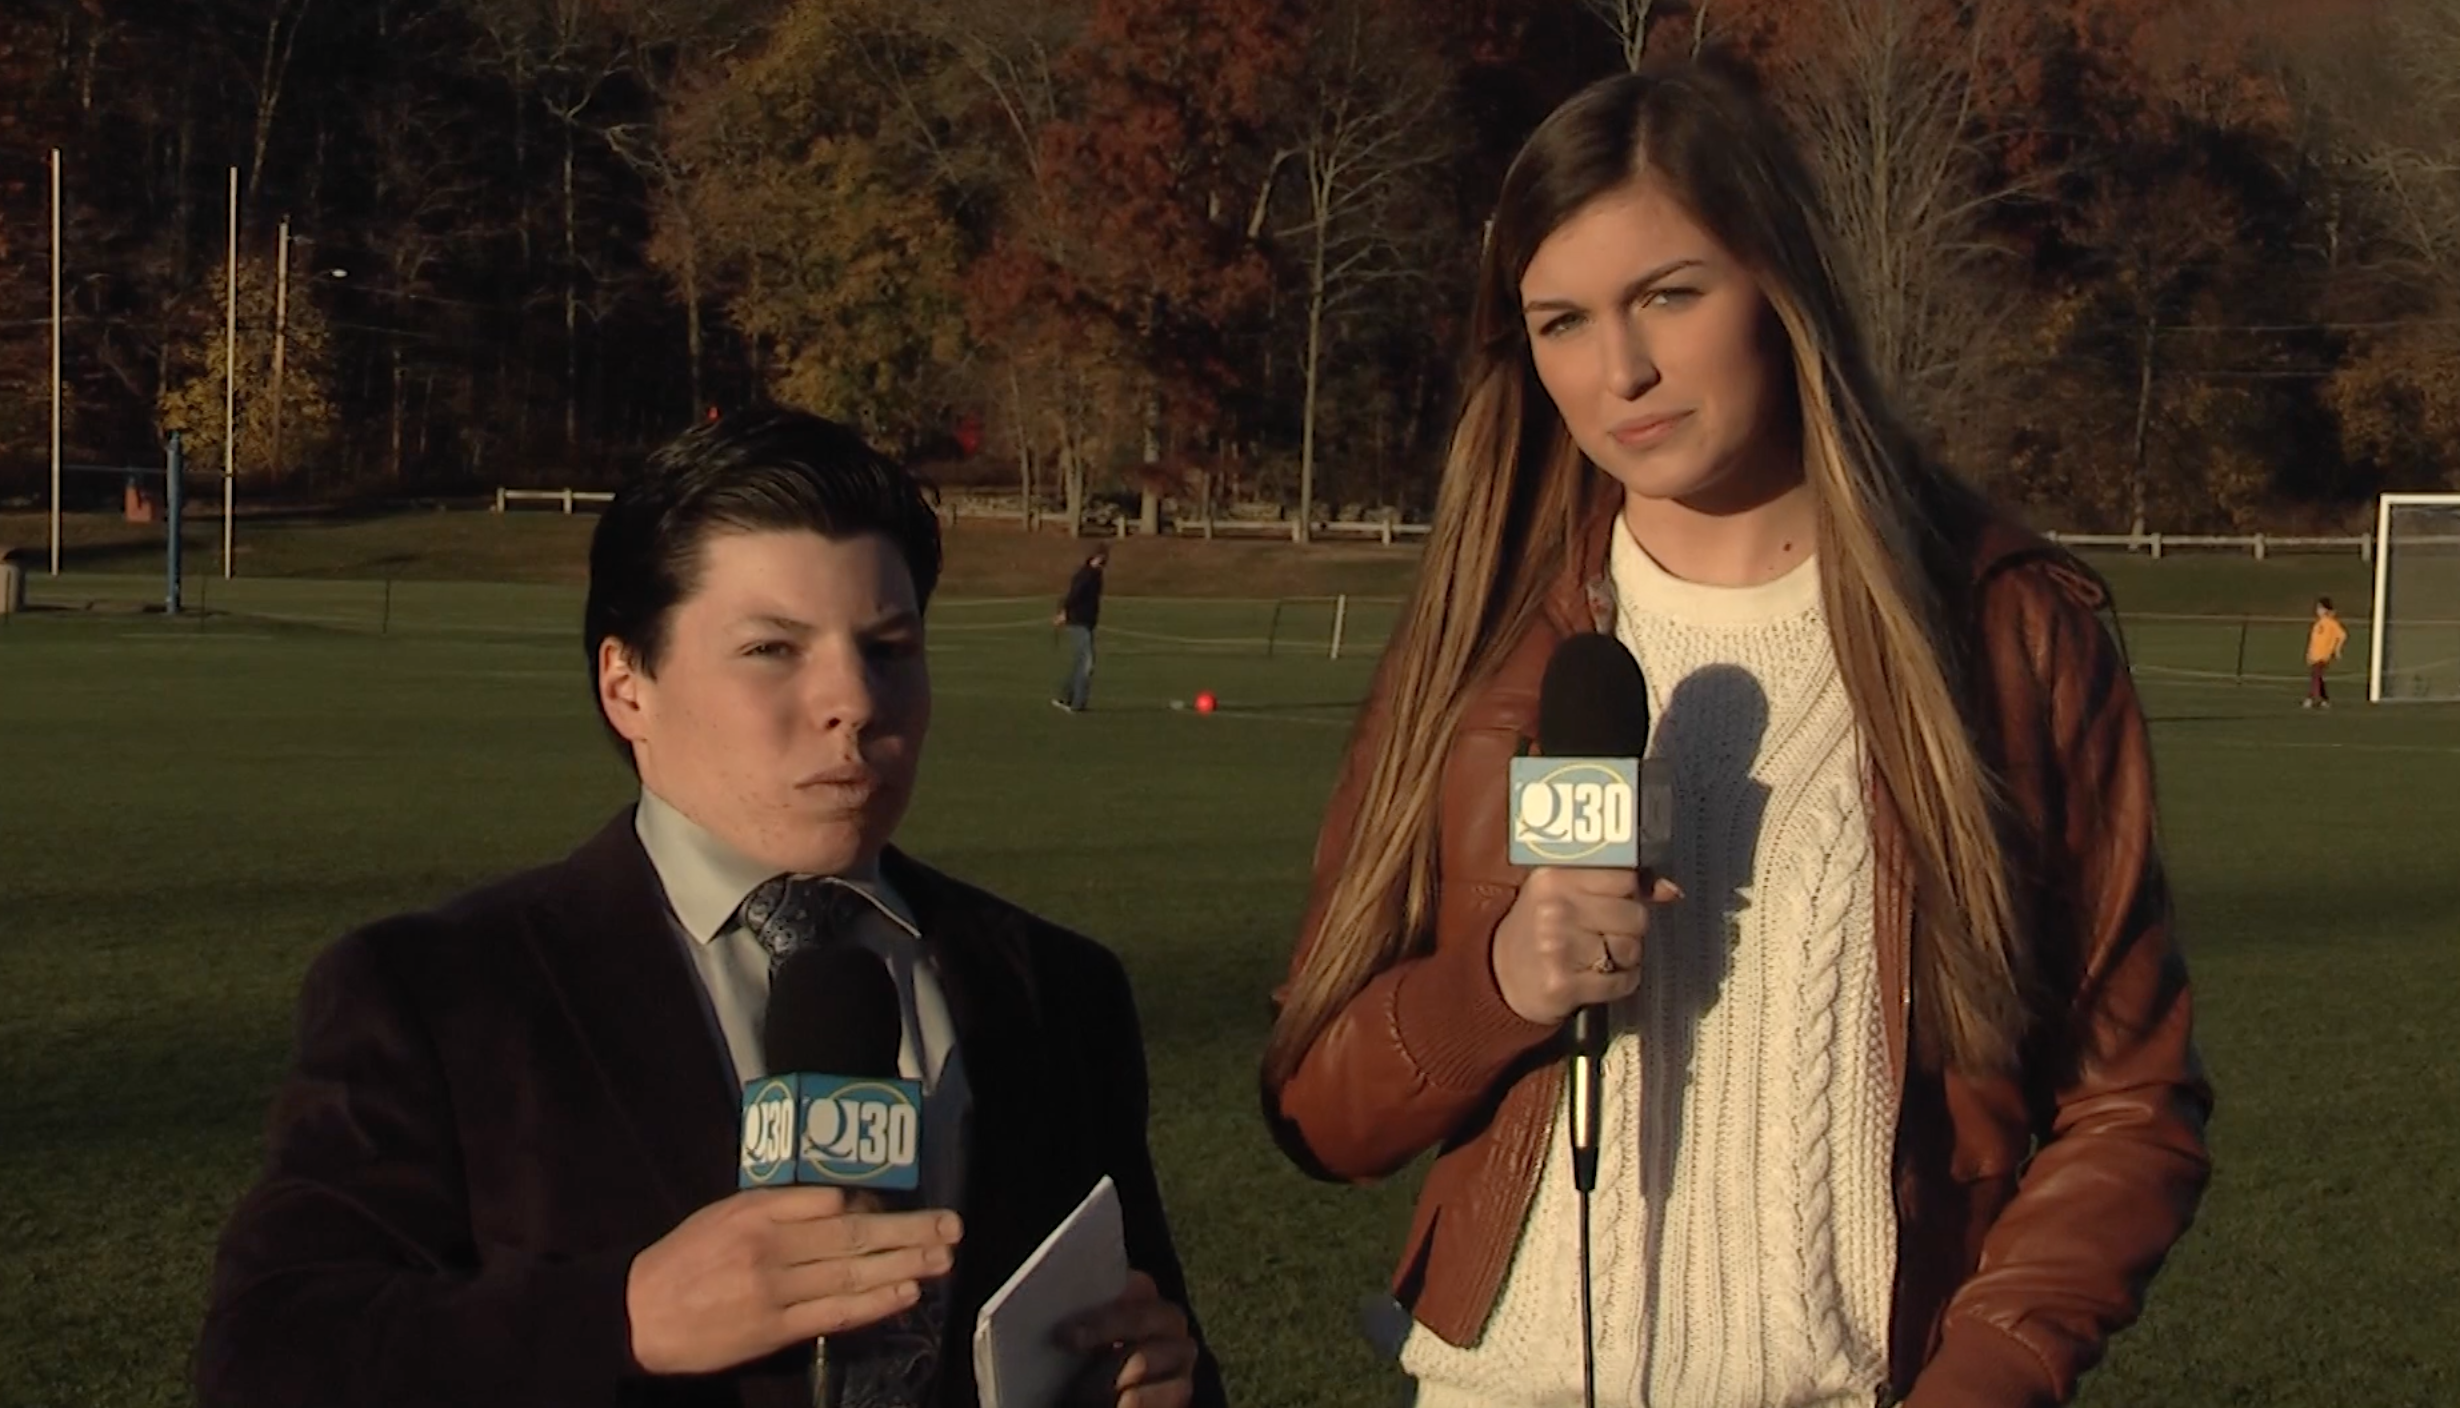 The Rebound: Quinnipiac men's soccer falls in chippy MAAC Championship game